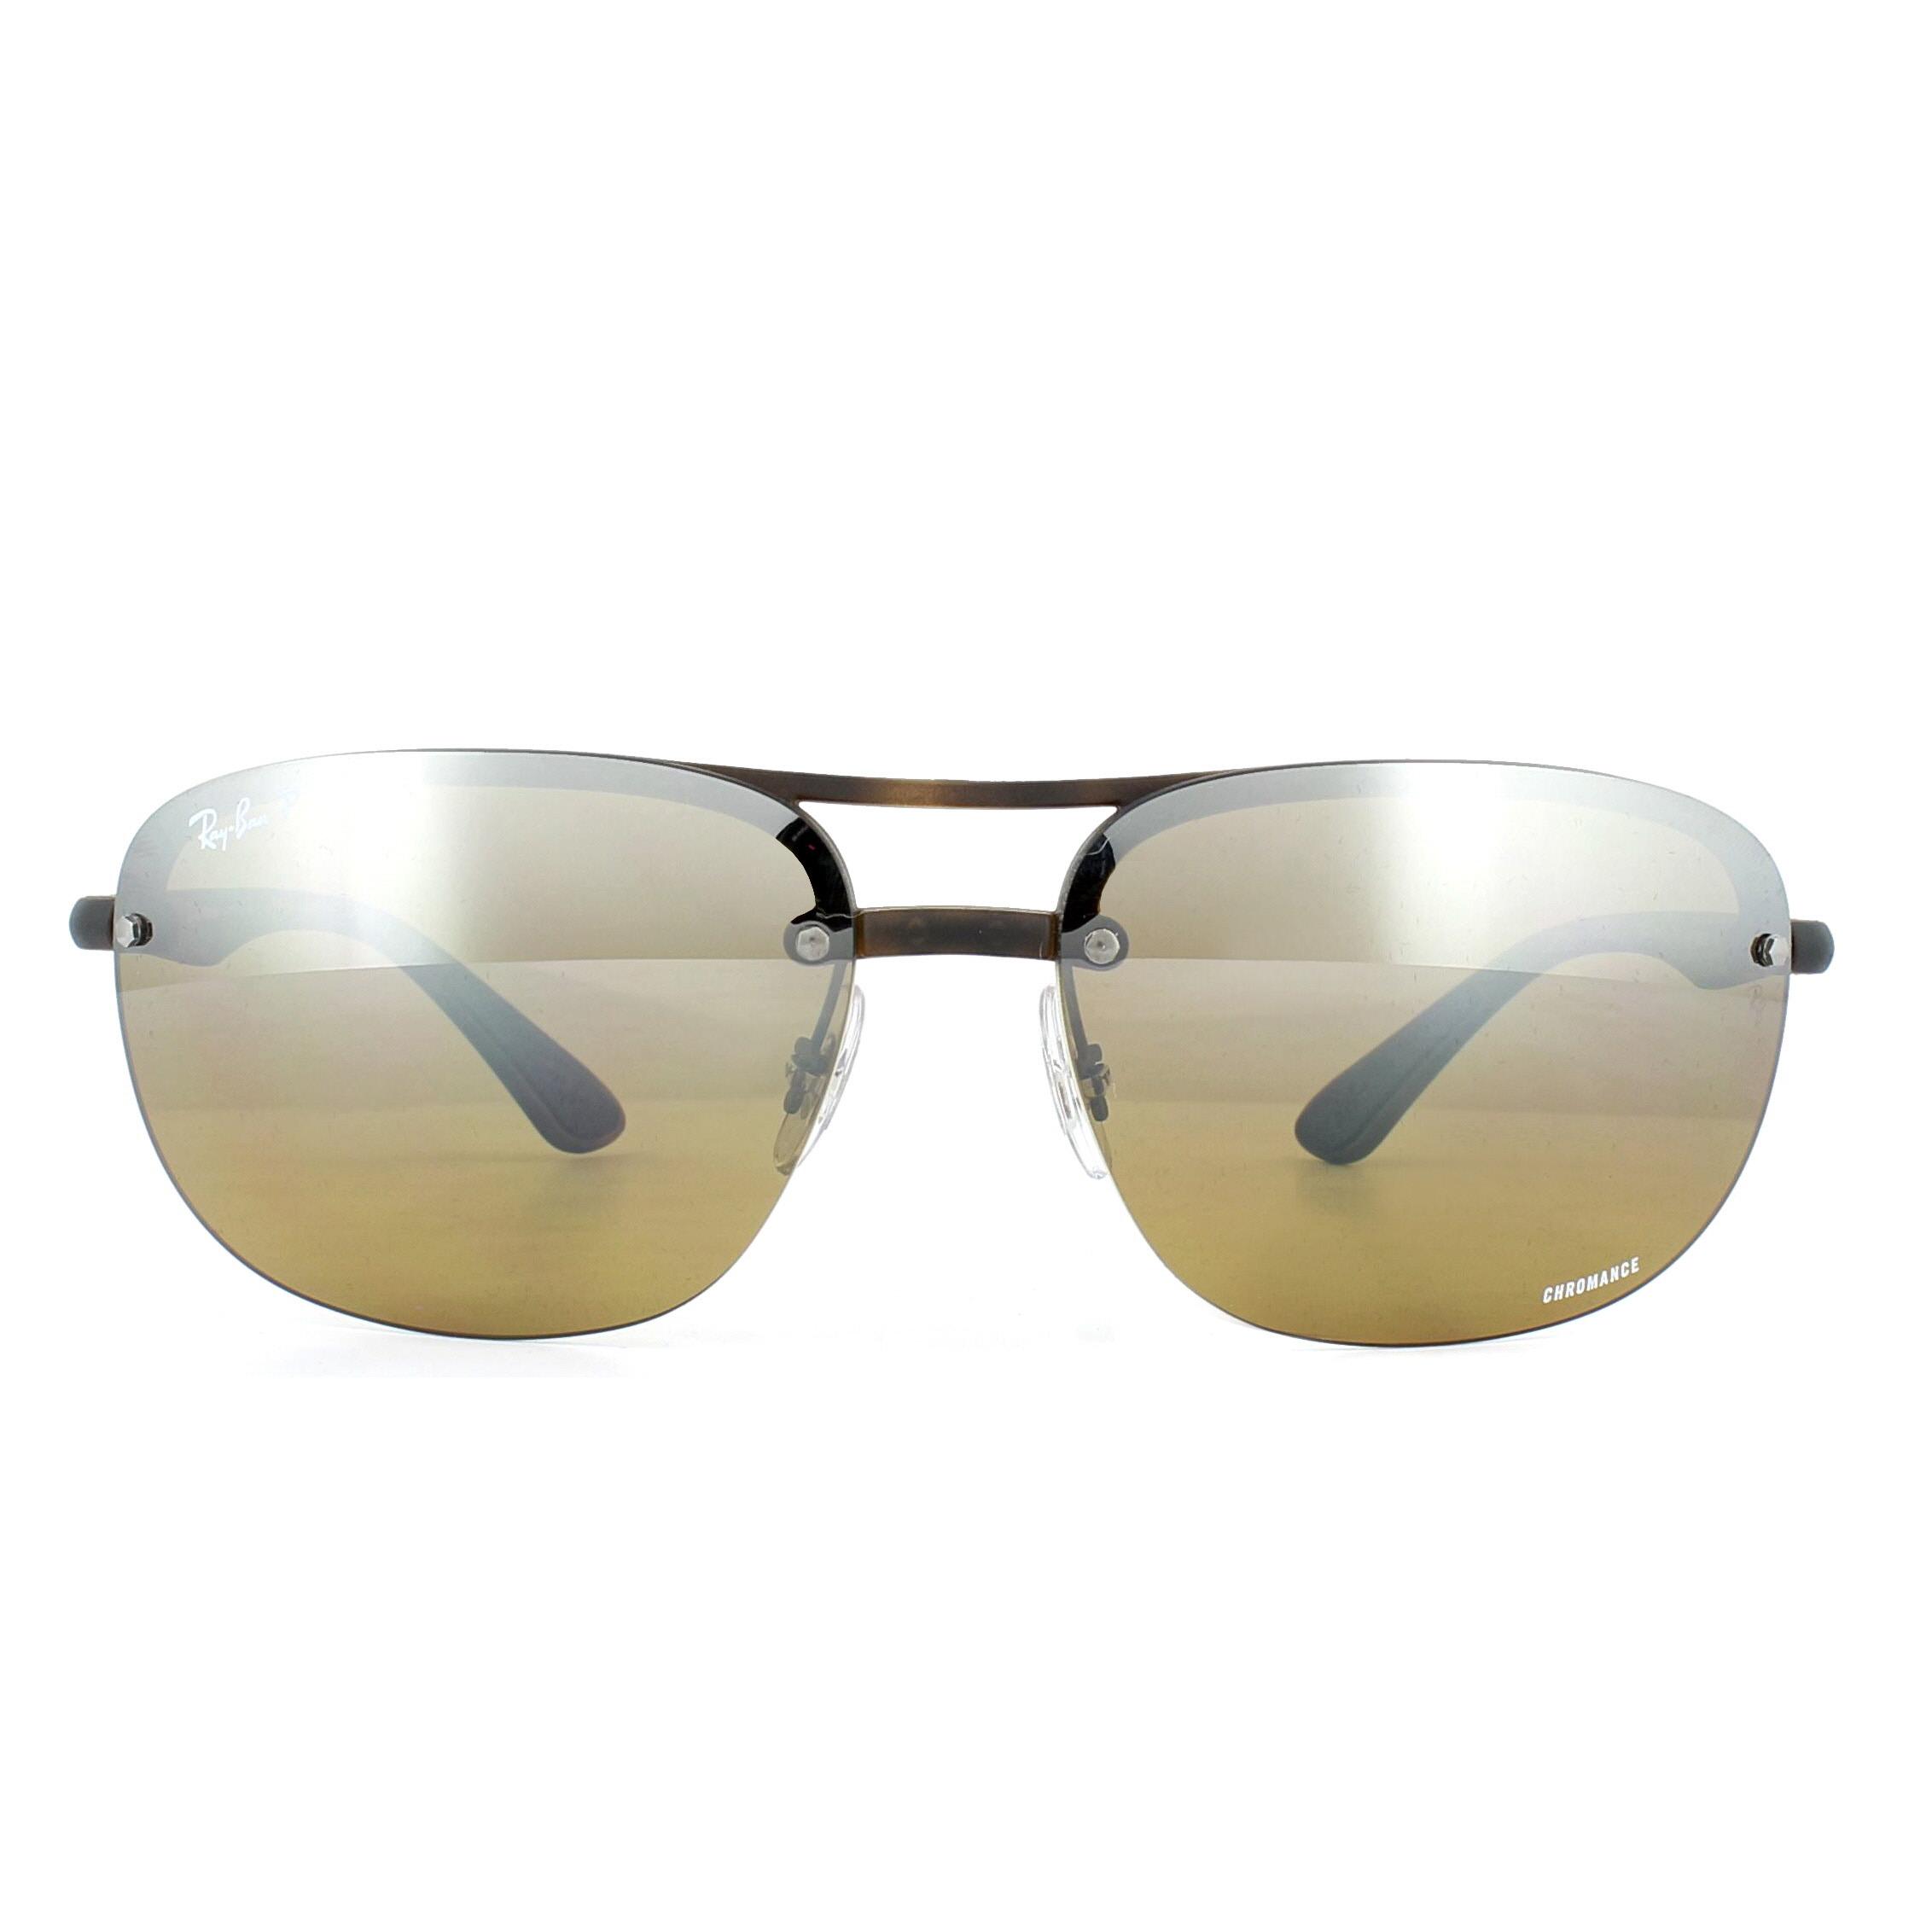 92d503e5a39 Sentinel Ray-Ban Sunglasses RB4275CH 894 A2 Tortoise Brown Mirror Polarized  Chromance